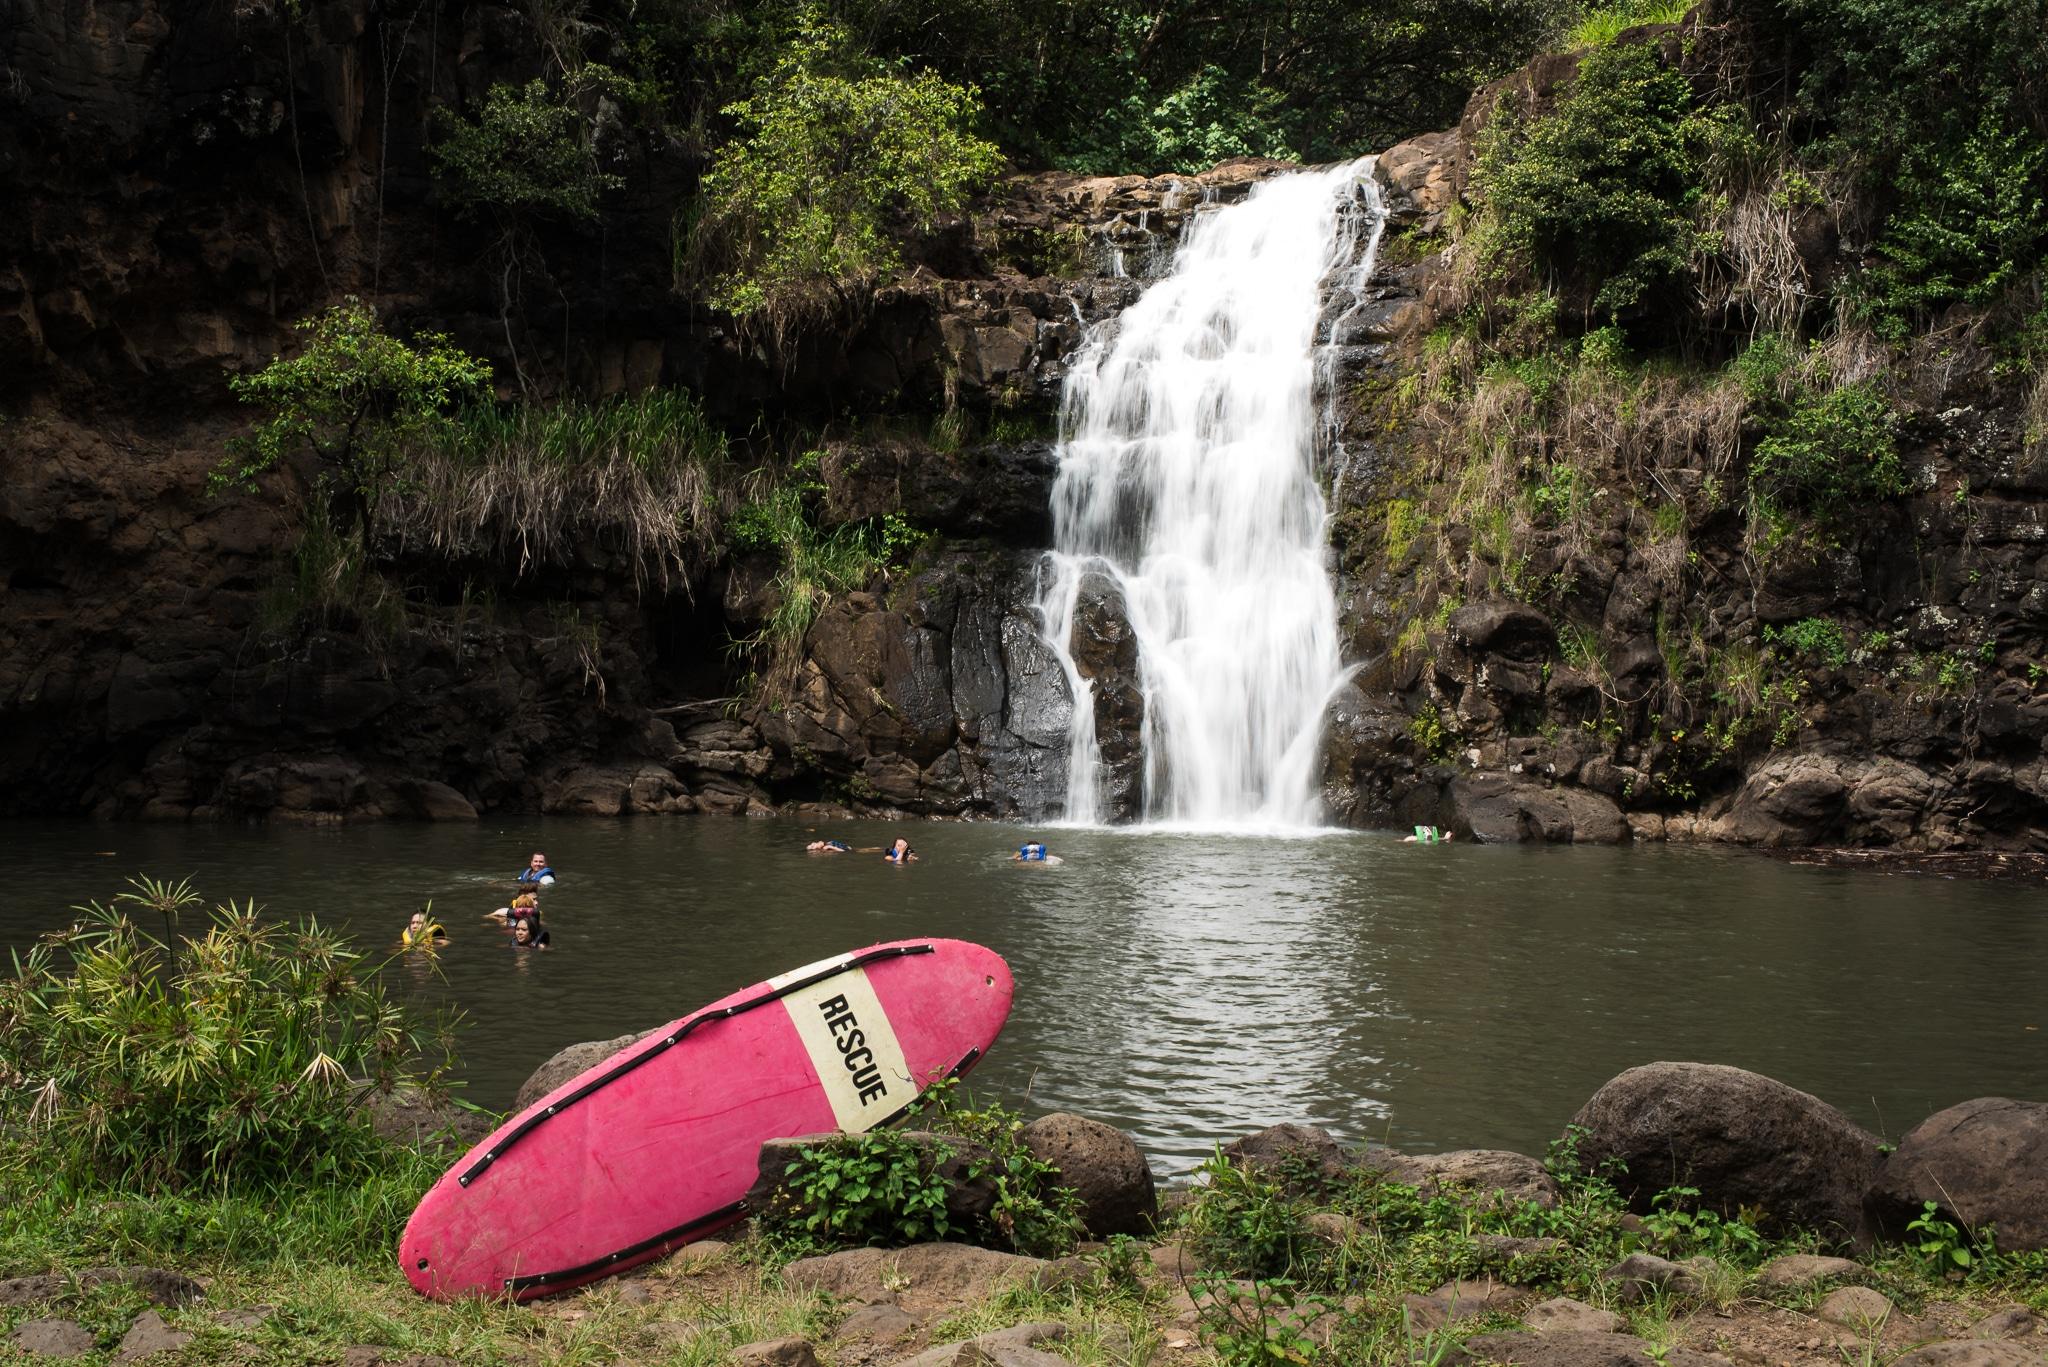 slow shutter speed for waterfalls